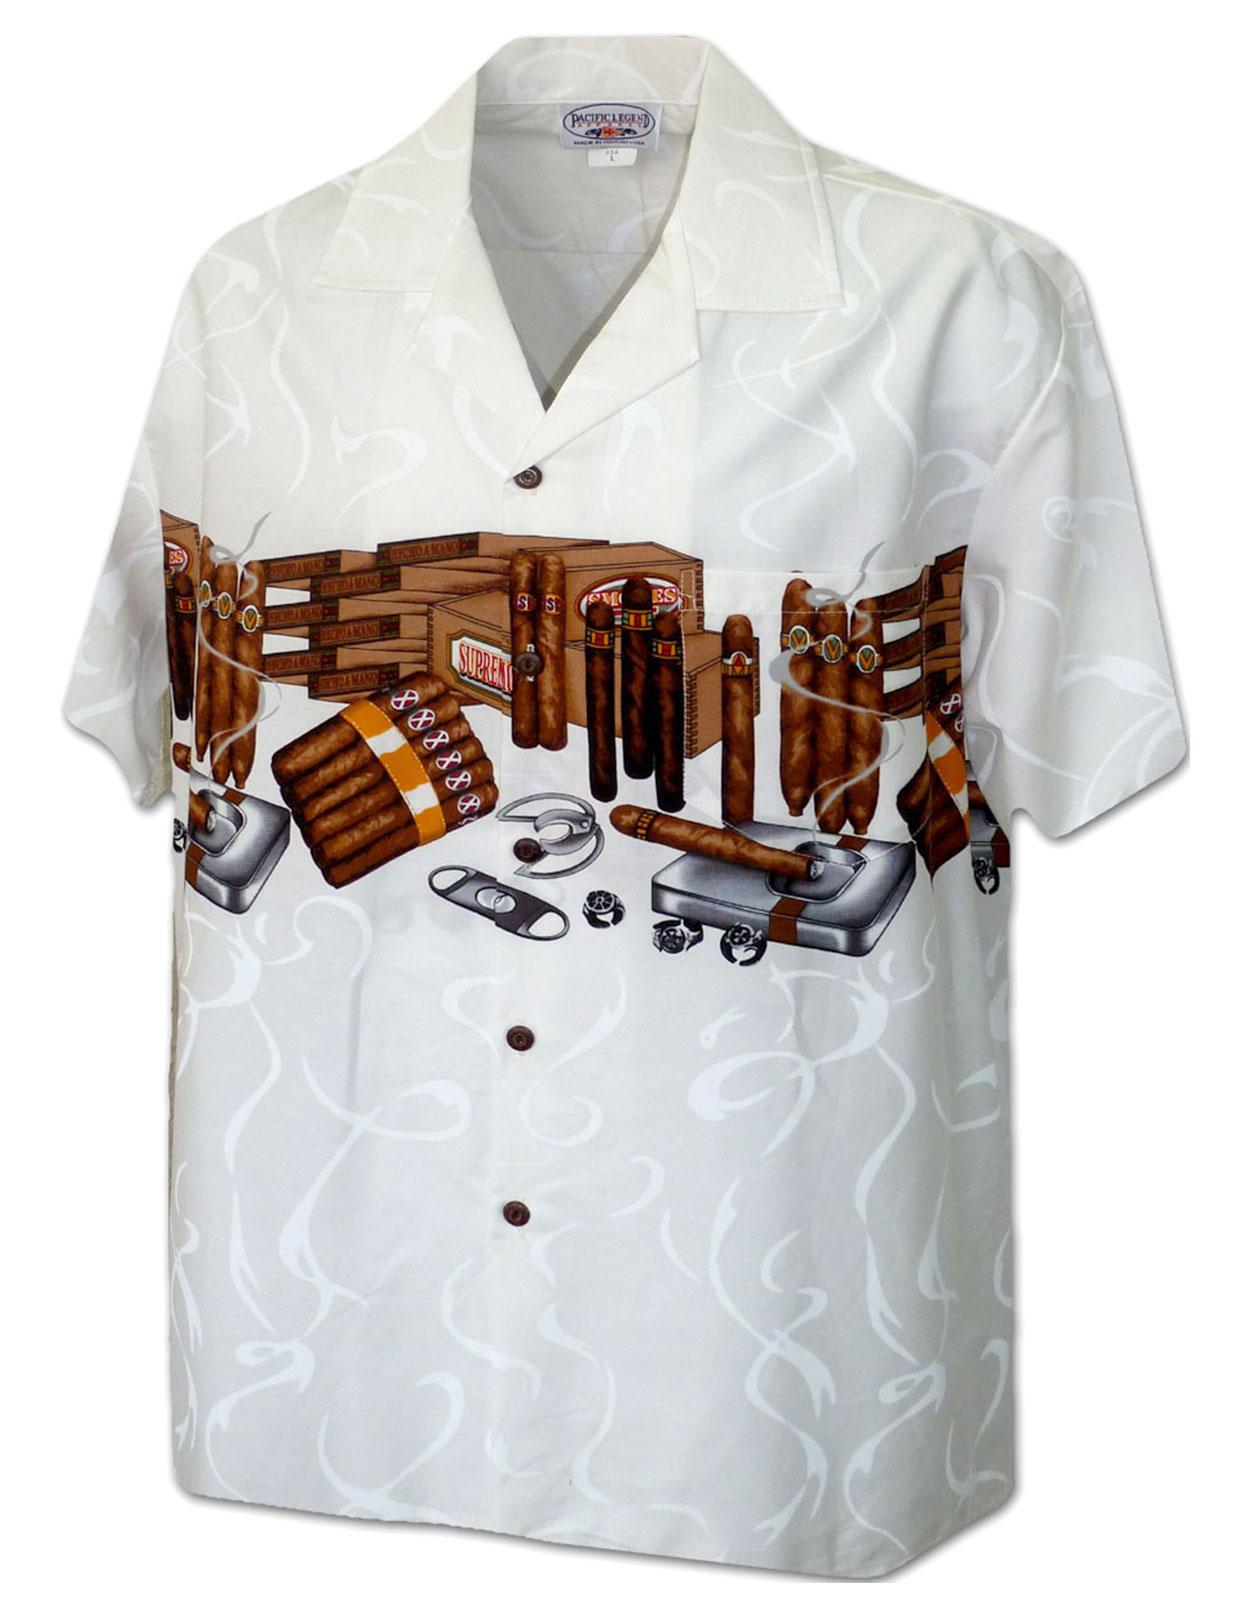 Cuban clothing store